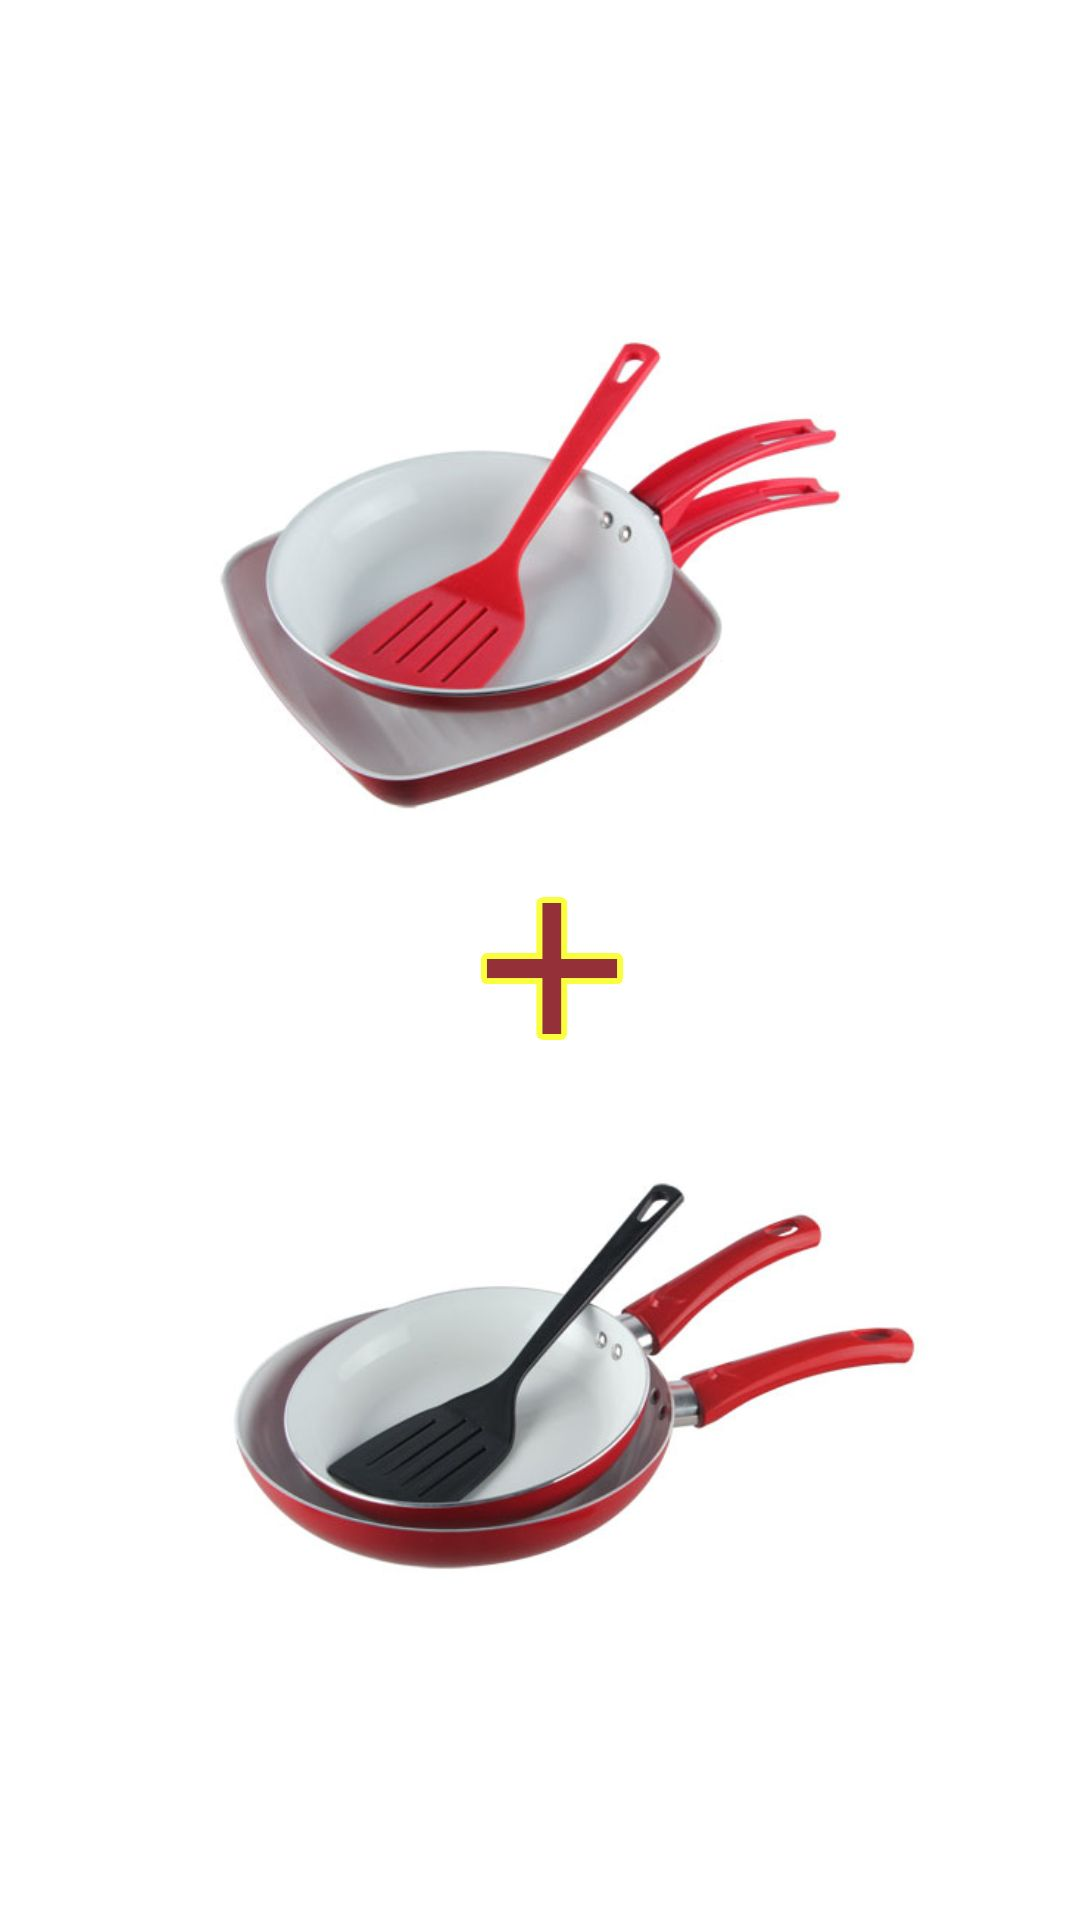 Kit de frigideiras 3 frigideiras + 1 bistekeira + 2 espatula AL012/AL010